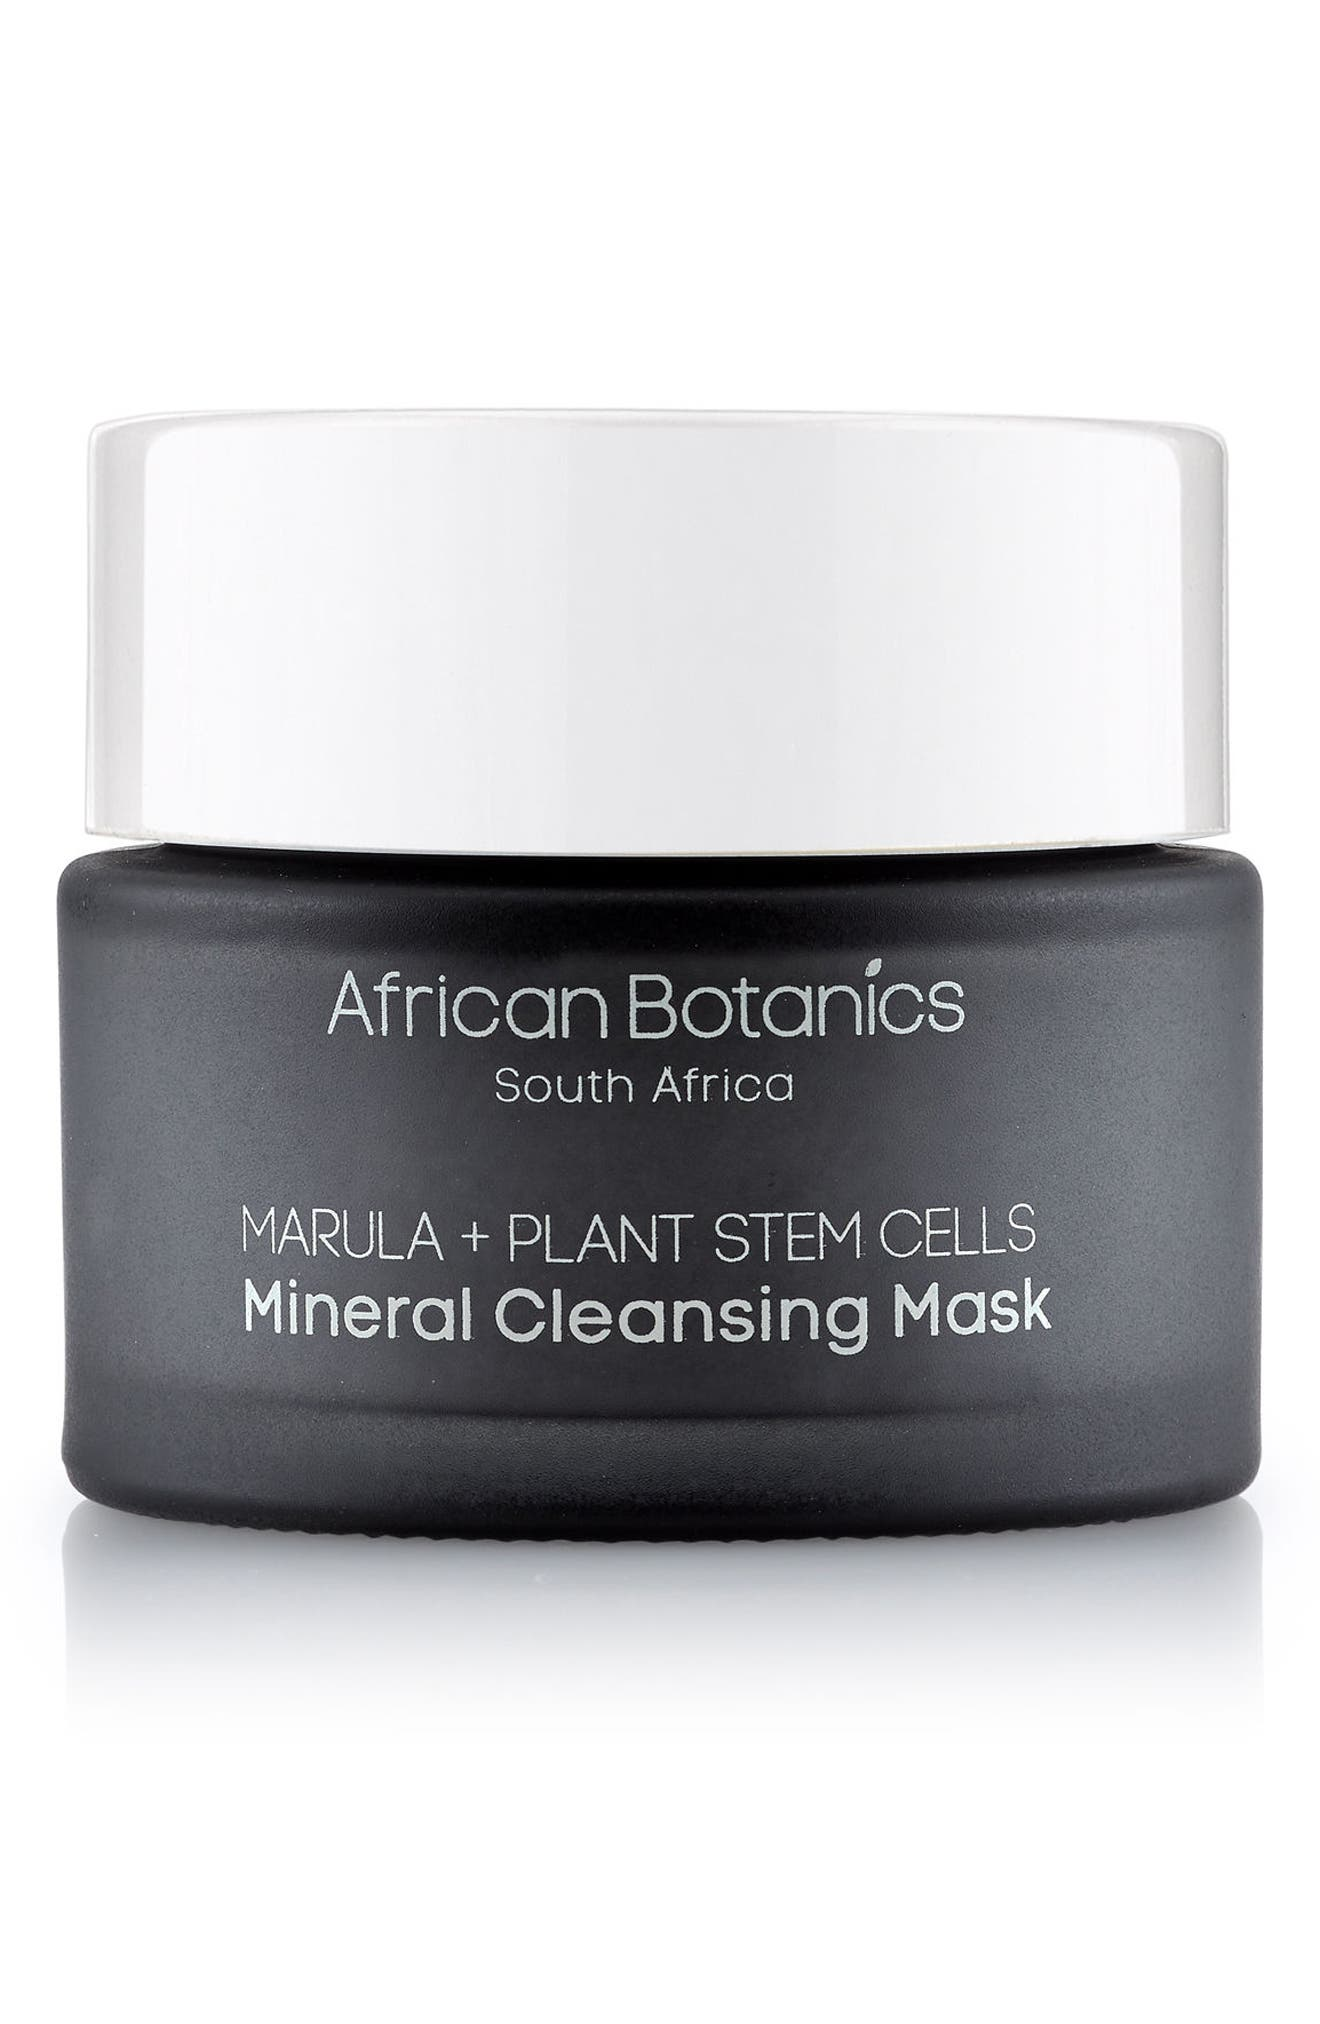 Marula Mineral Cleansing Mask,                             Main thumbnail 1, color,                             No Color